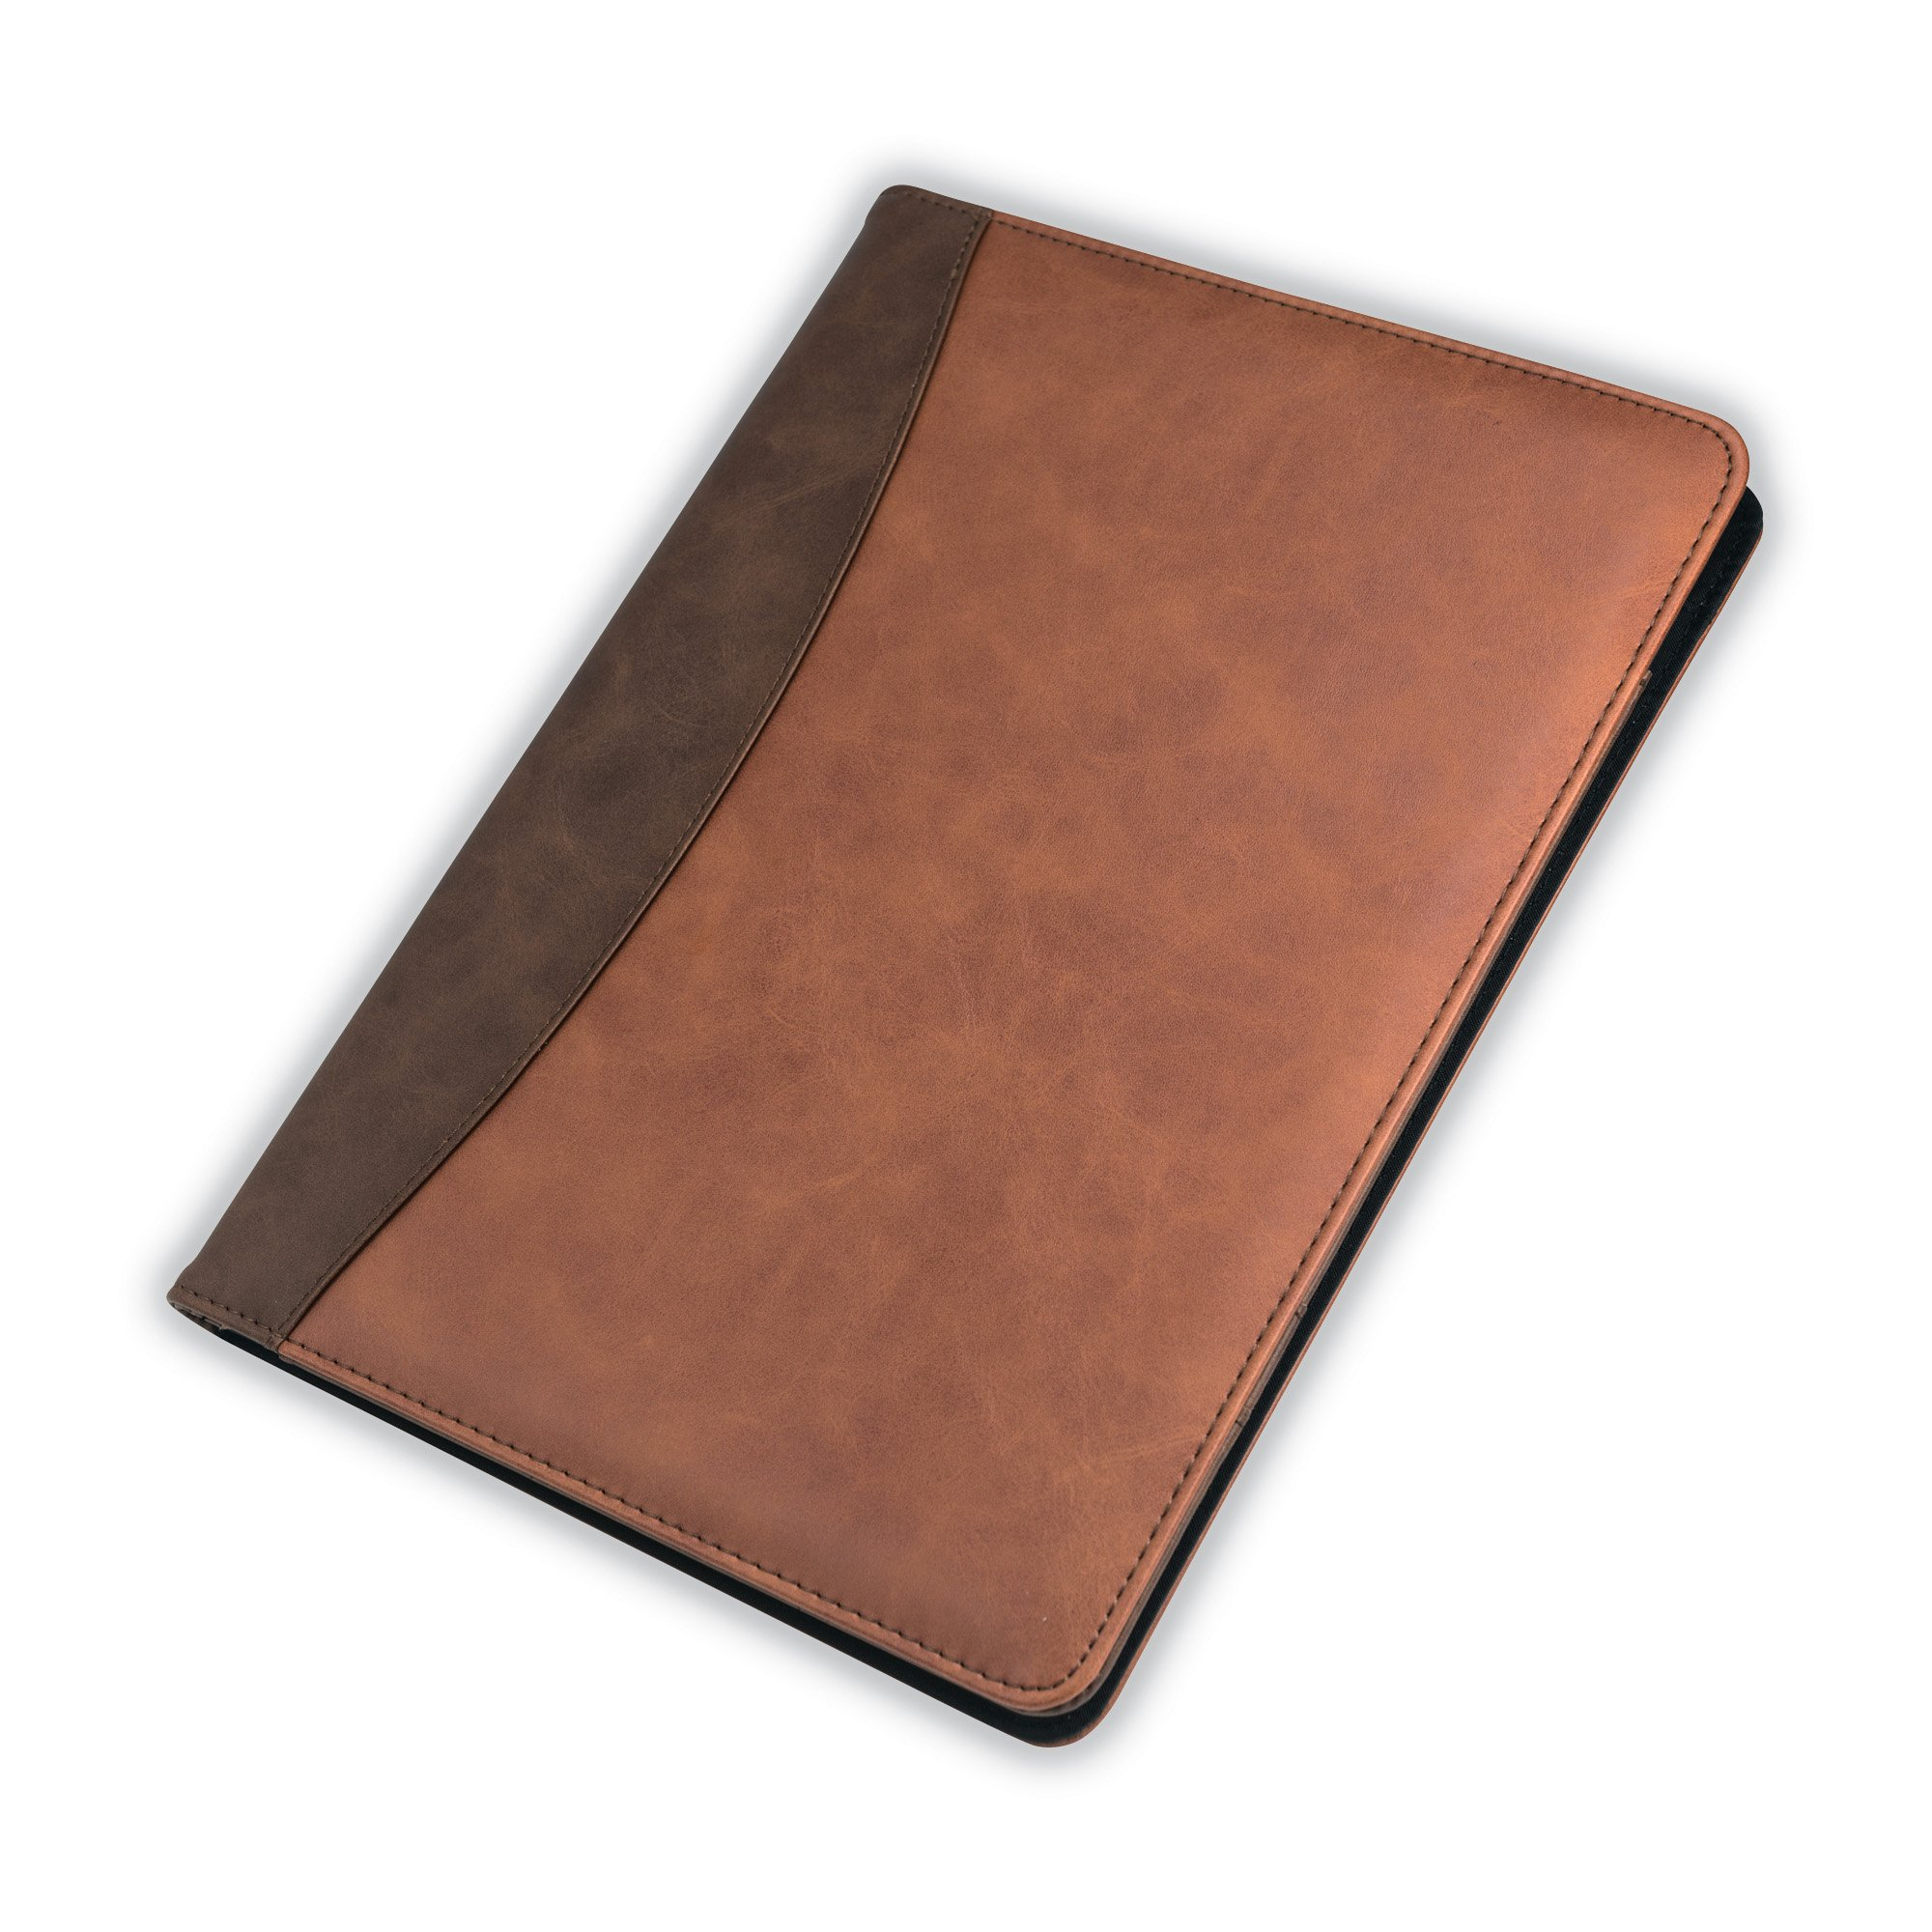 Samsill Two-Tone Padfolio – Resume Portfolio/Business Portfolio & Organizer, Writing Pad (Brown & Dark Brown, Letter Size)